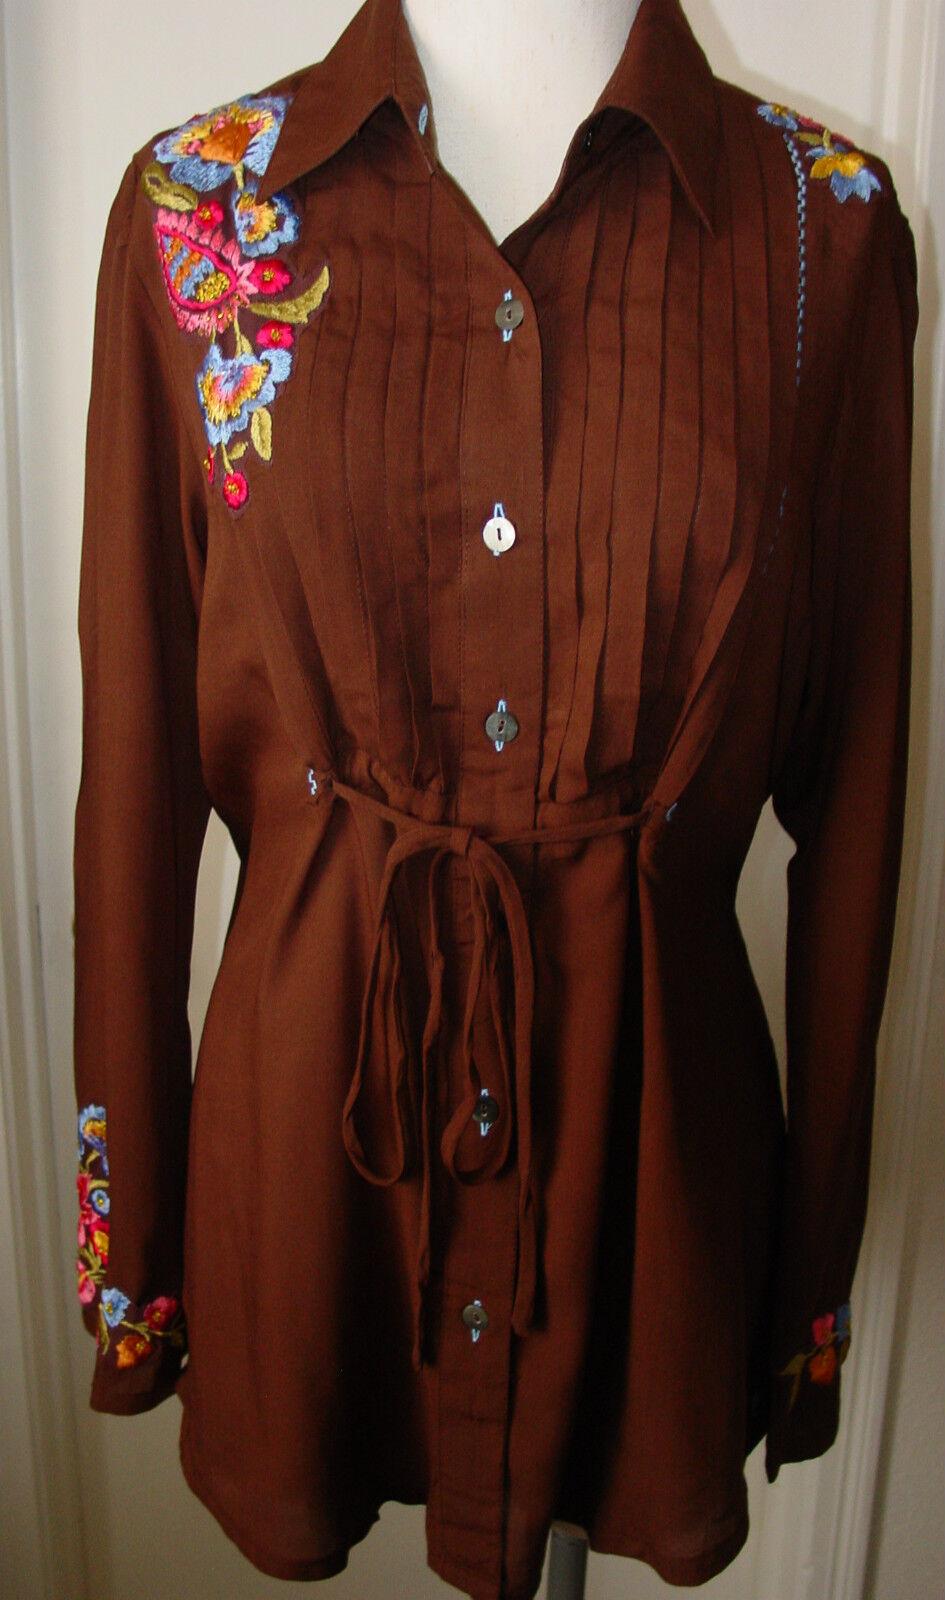 Woherren Blouse Tunic Top Krista Lee Florence braun Embroidery Buttons Tie Waist